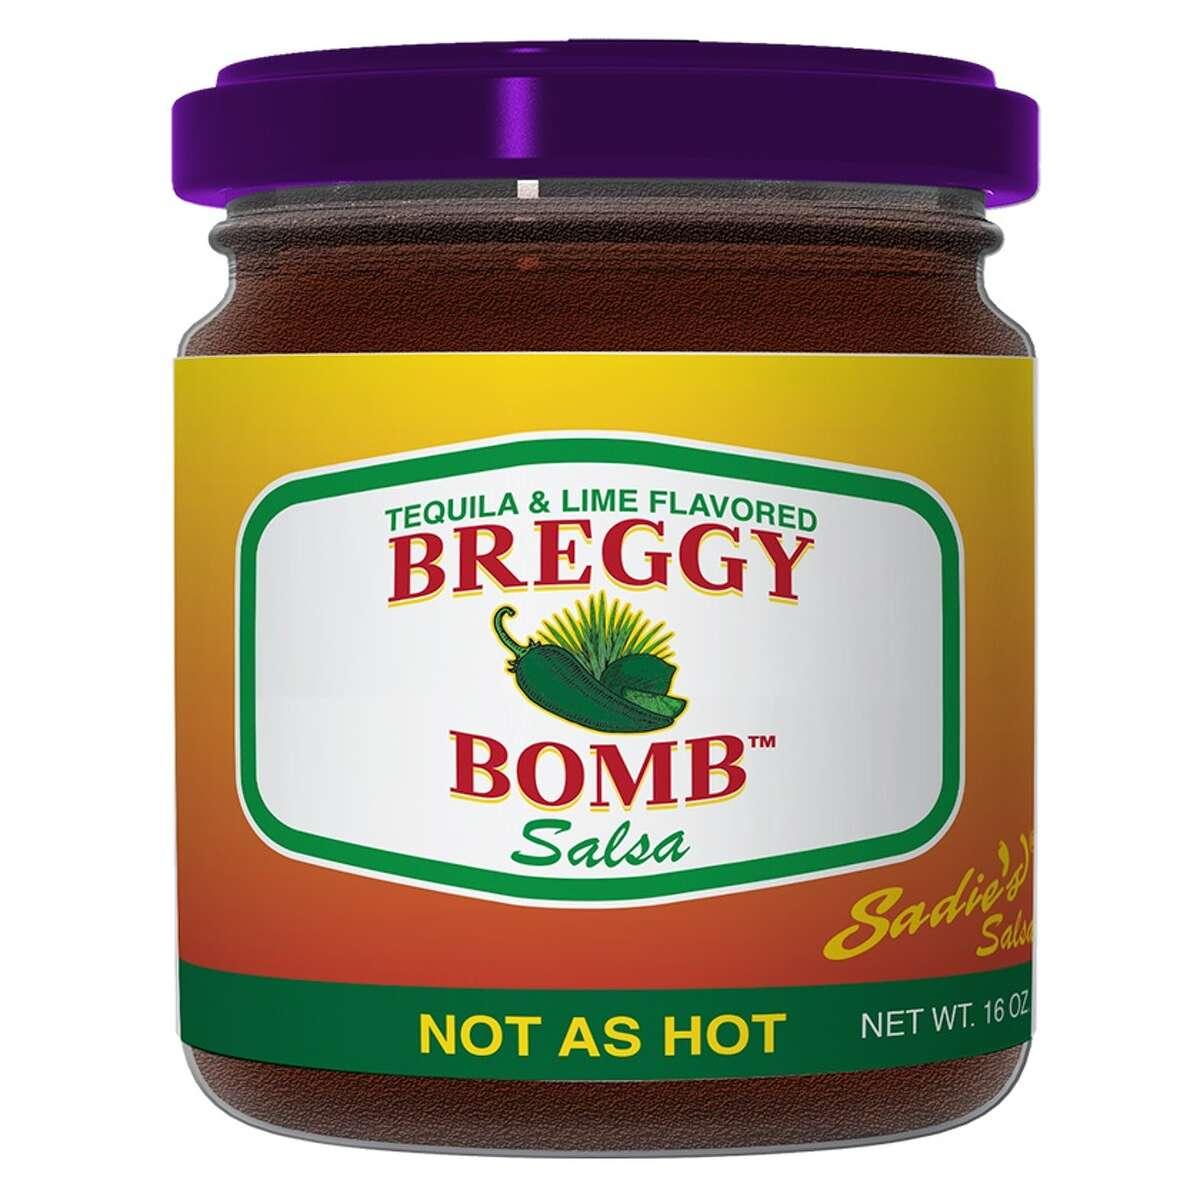 Breggy Bomb Salsa is a new jarred salsa from Houston Astros third baseman Alex Bregman.